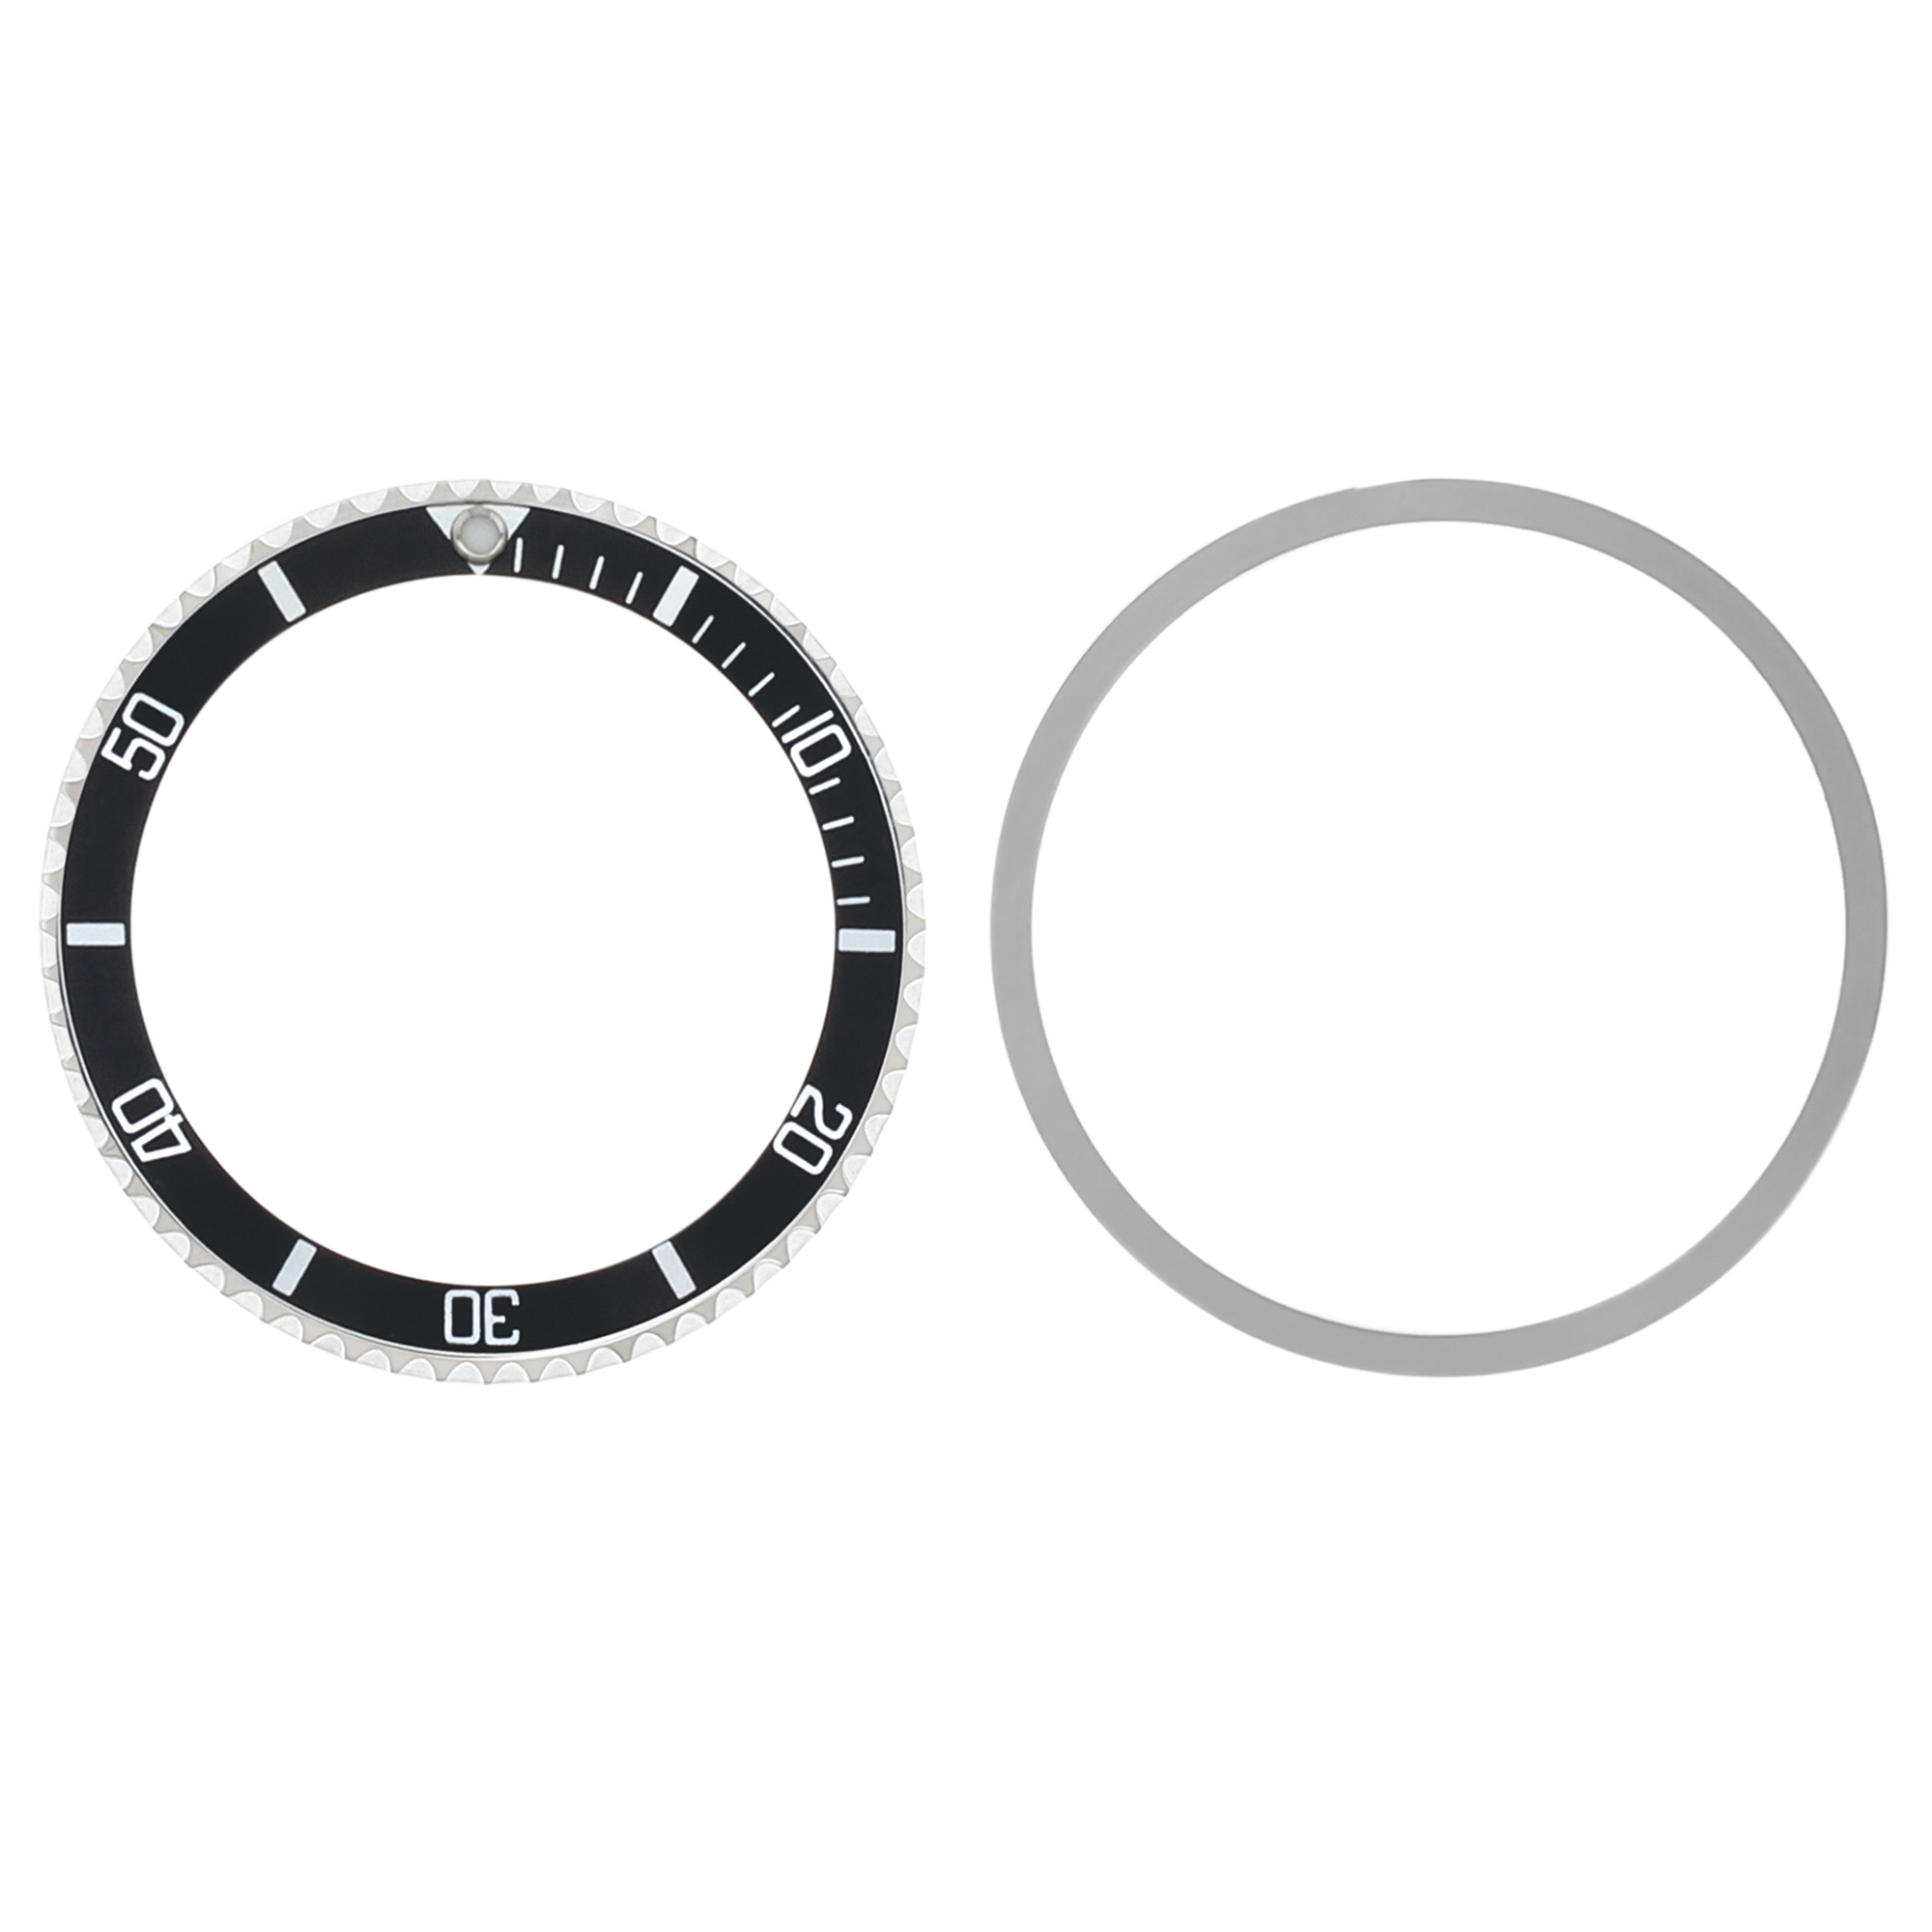 BEZEL RING COMPLETE FOR ROLEX SUBMARINER + TENSION + INSERT 5508 5513 BLACK